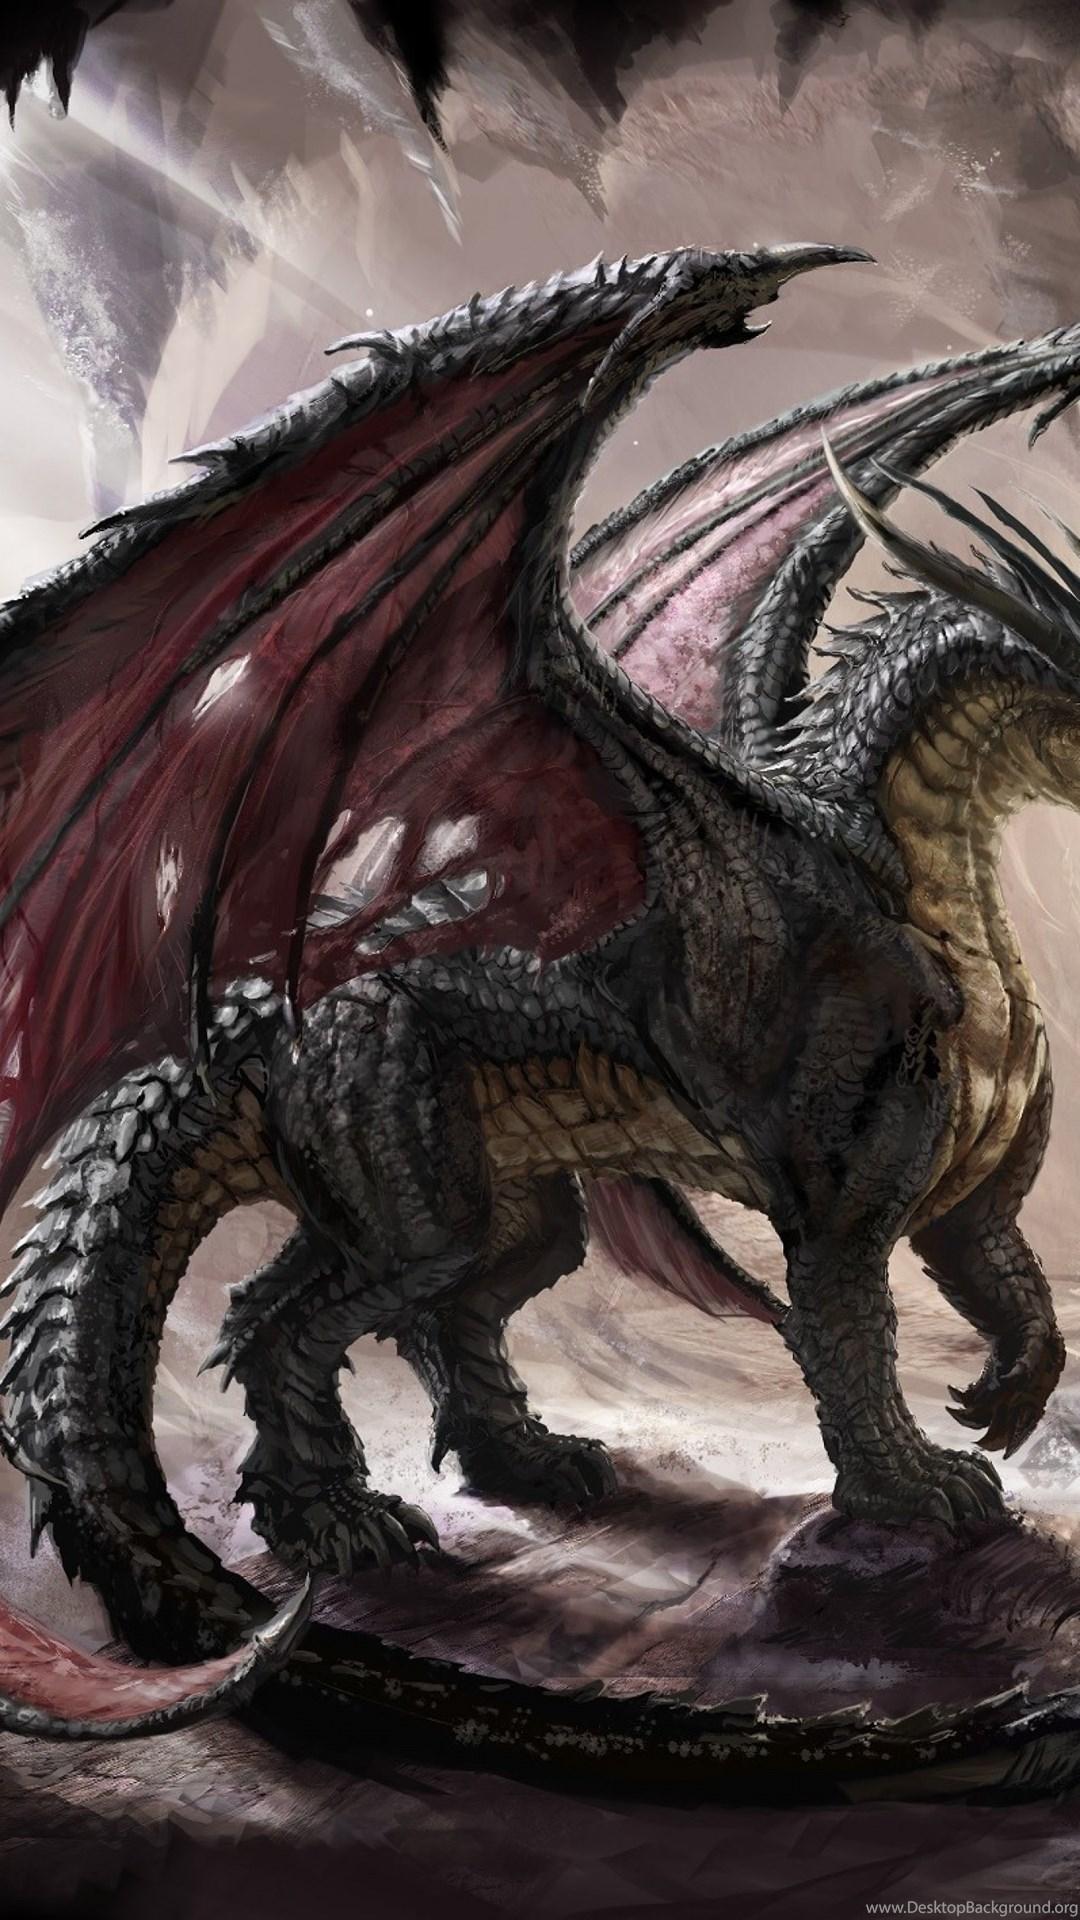 Download Wallpapers 3840x2400 Dragon Cave Light Art